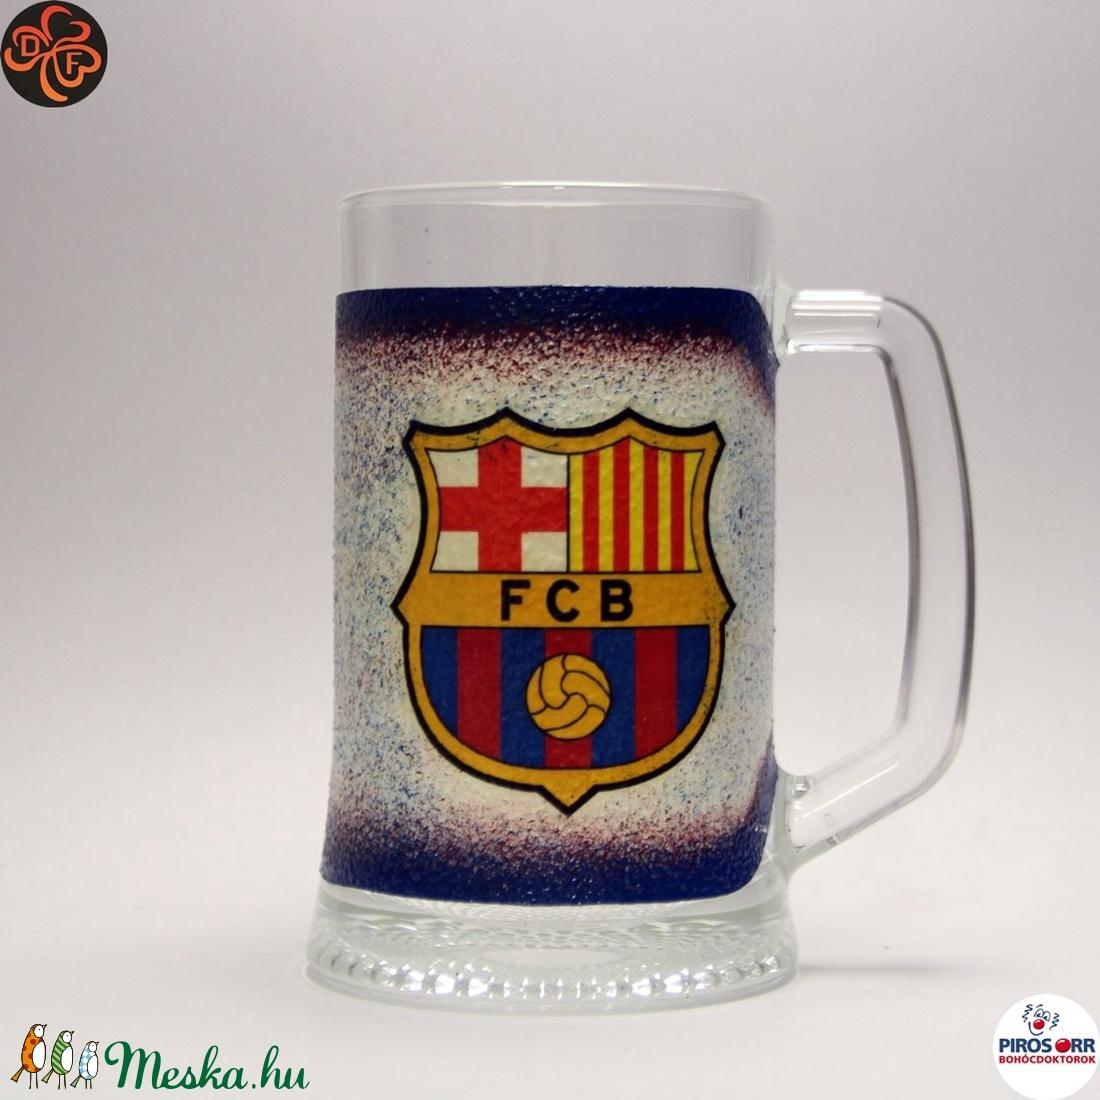 FC Barcelona sörös korsó ; foci szurkolóknak (decorfantasy) - Meska.hu